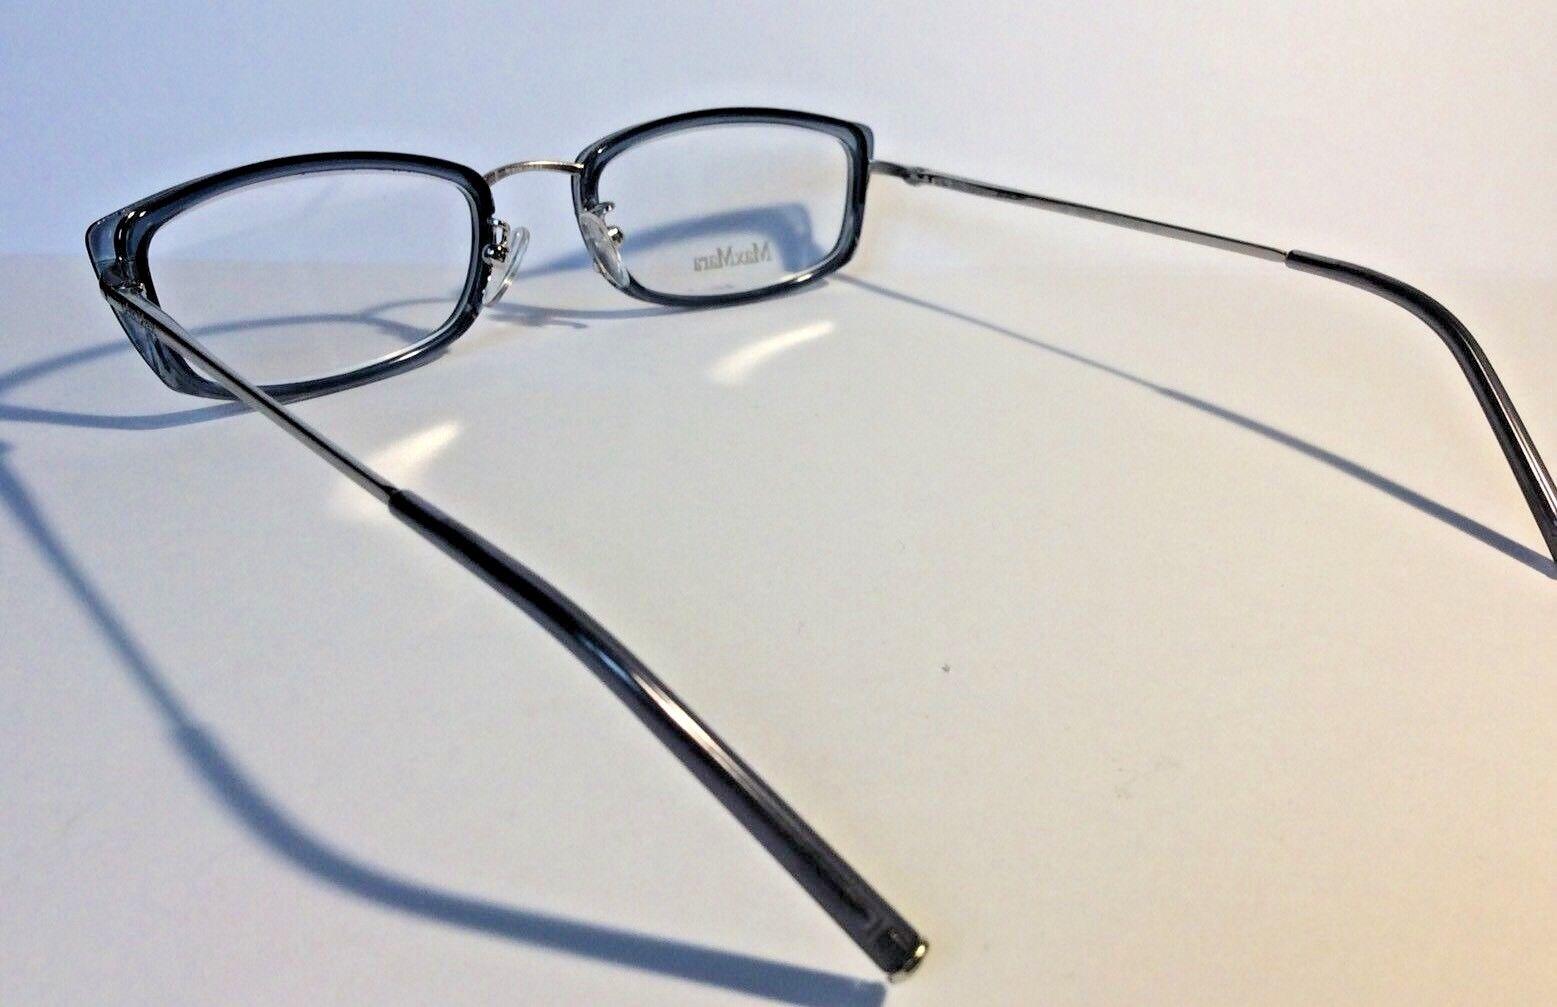 MAX MARA Original Brille Eyeglasses Occhiali Model MM215 Damen Metall NEU